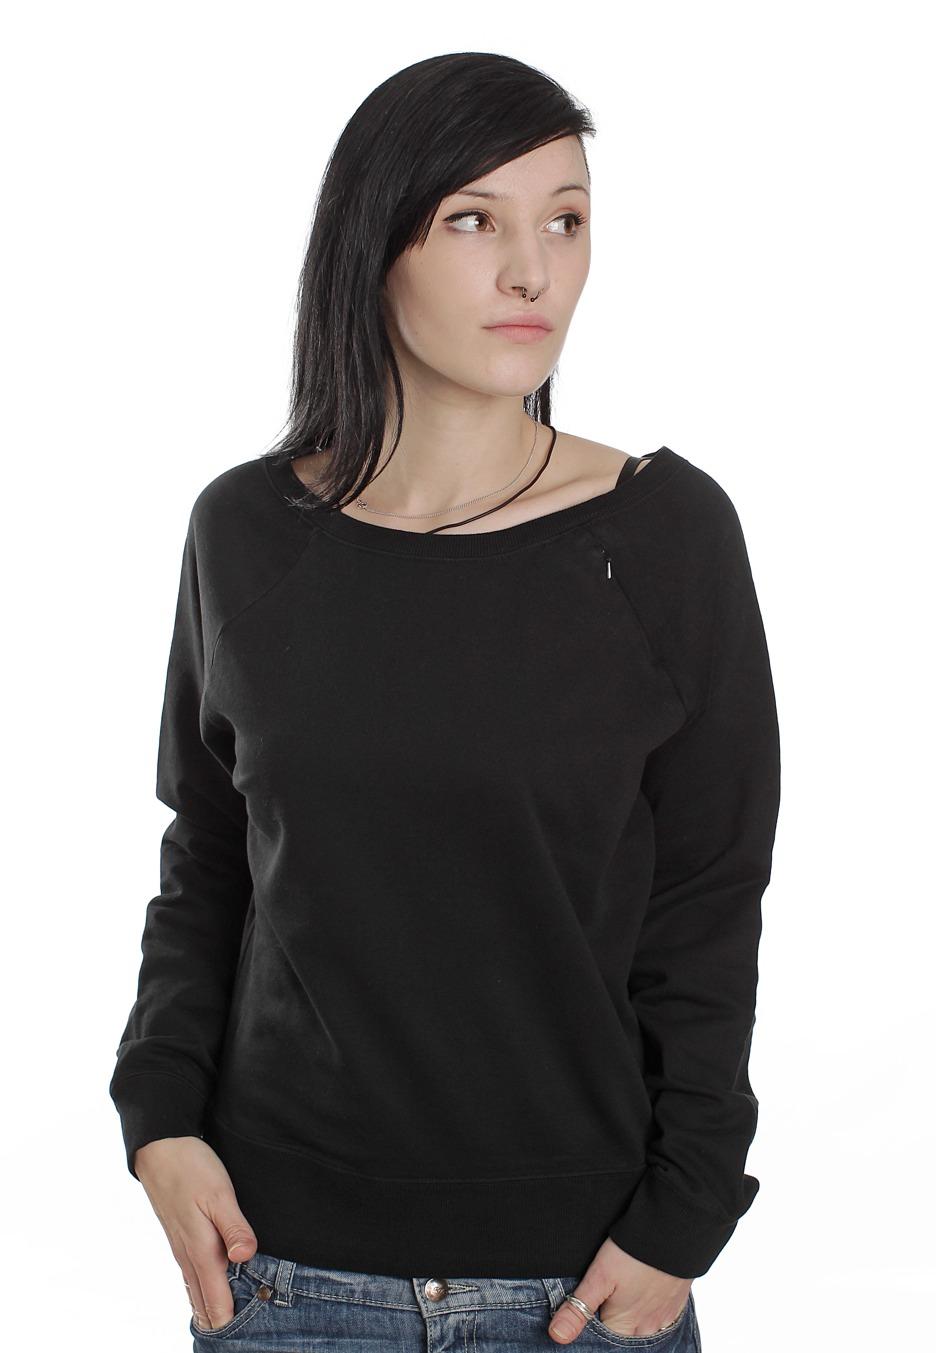 Nike 6.0 - Pyt Black/Black - Girl Sweater - Streetwear Shop ...